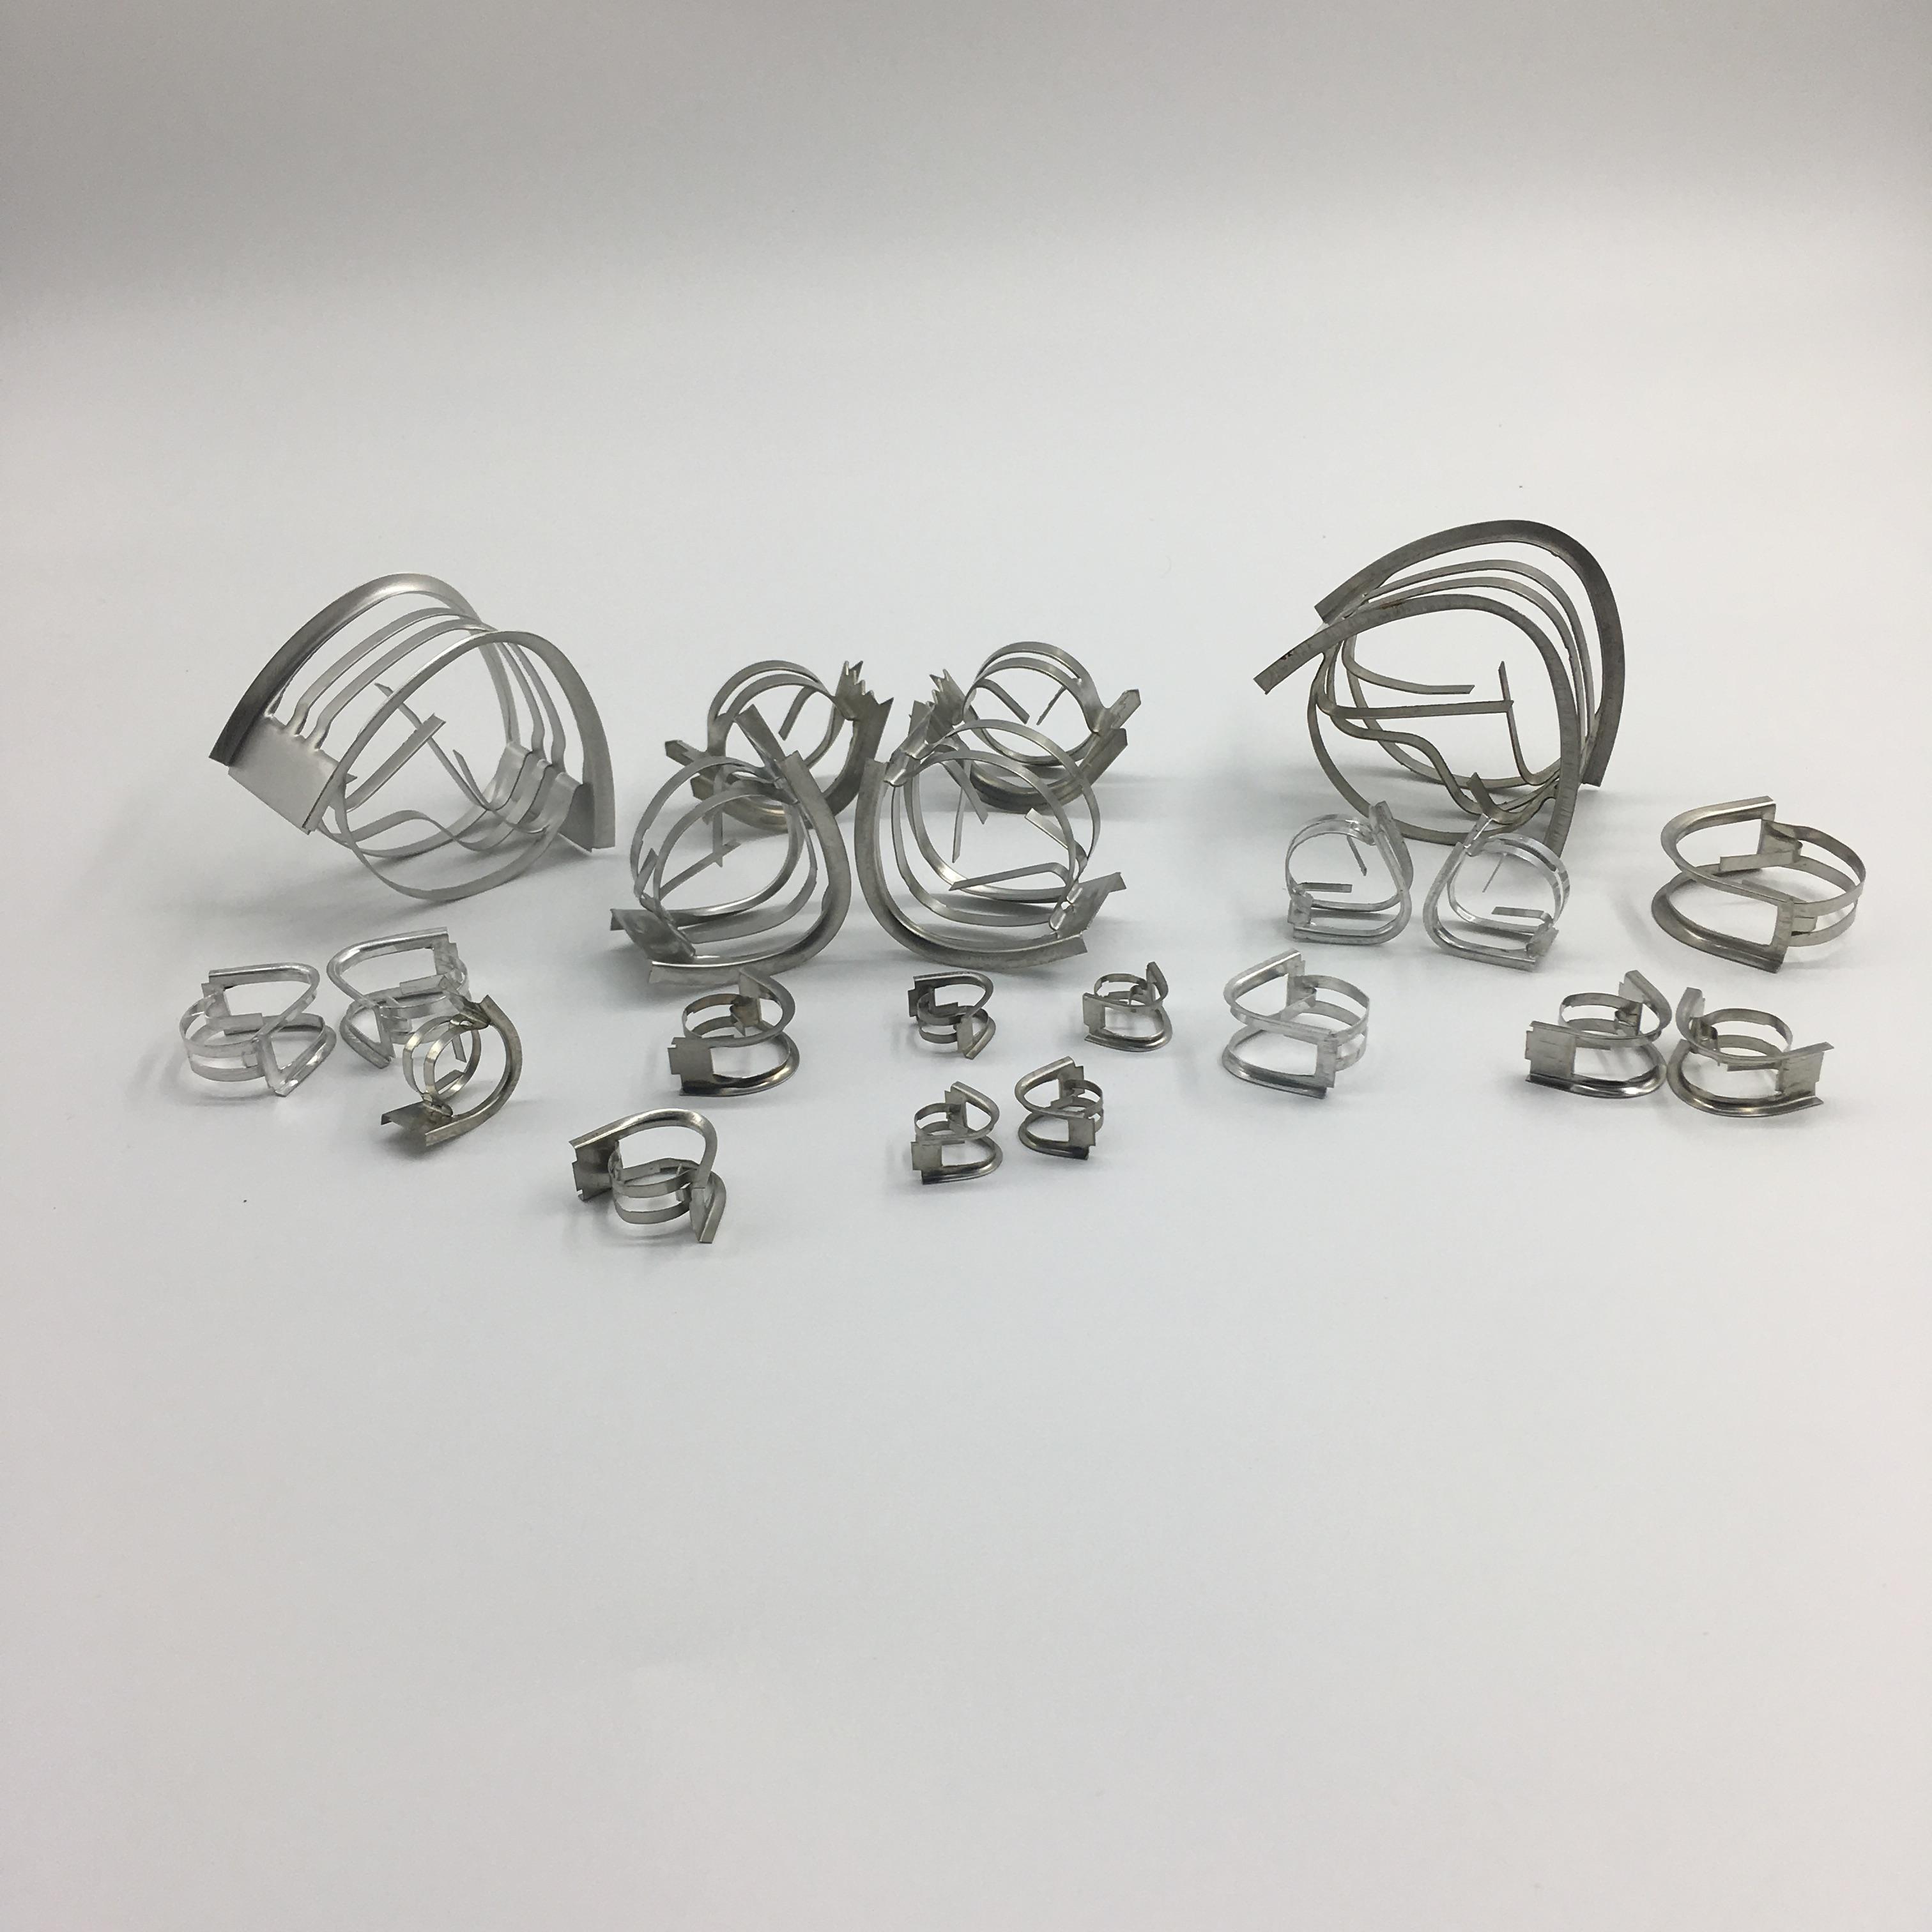 I RING IMTP Intalox Metal Tower Packing Random Packing